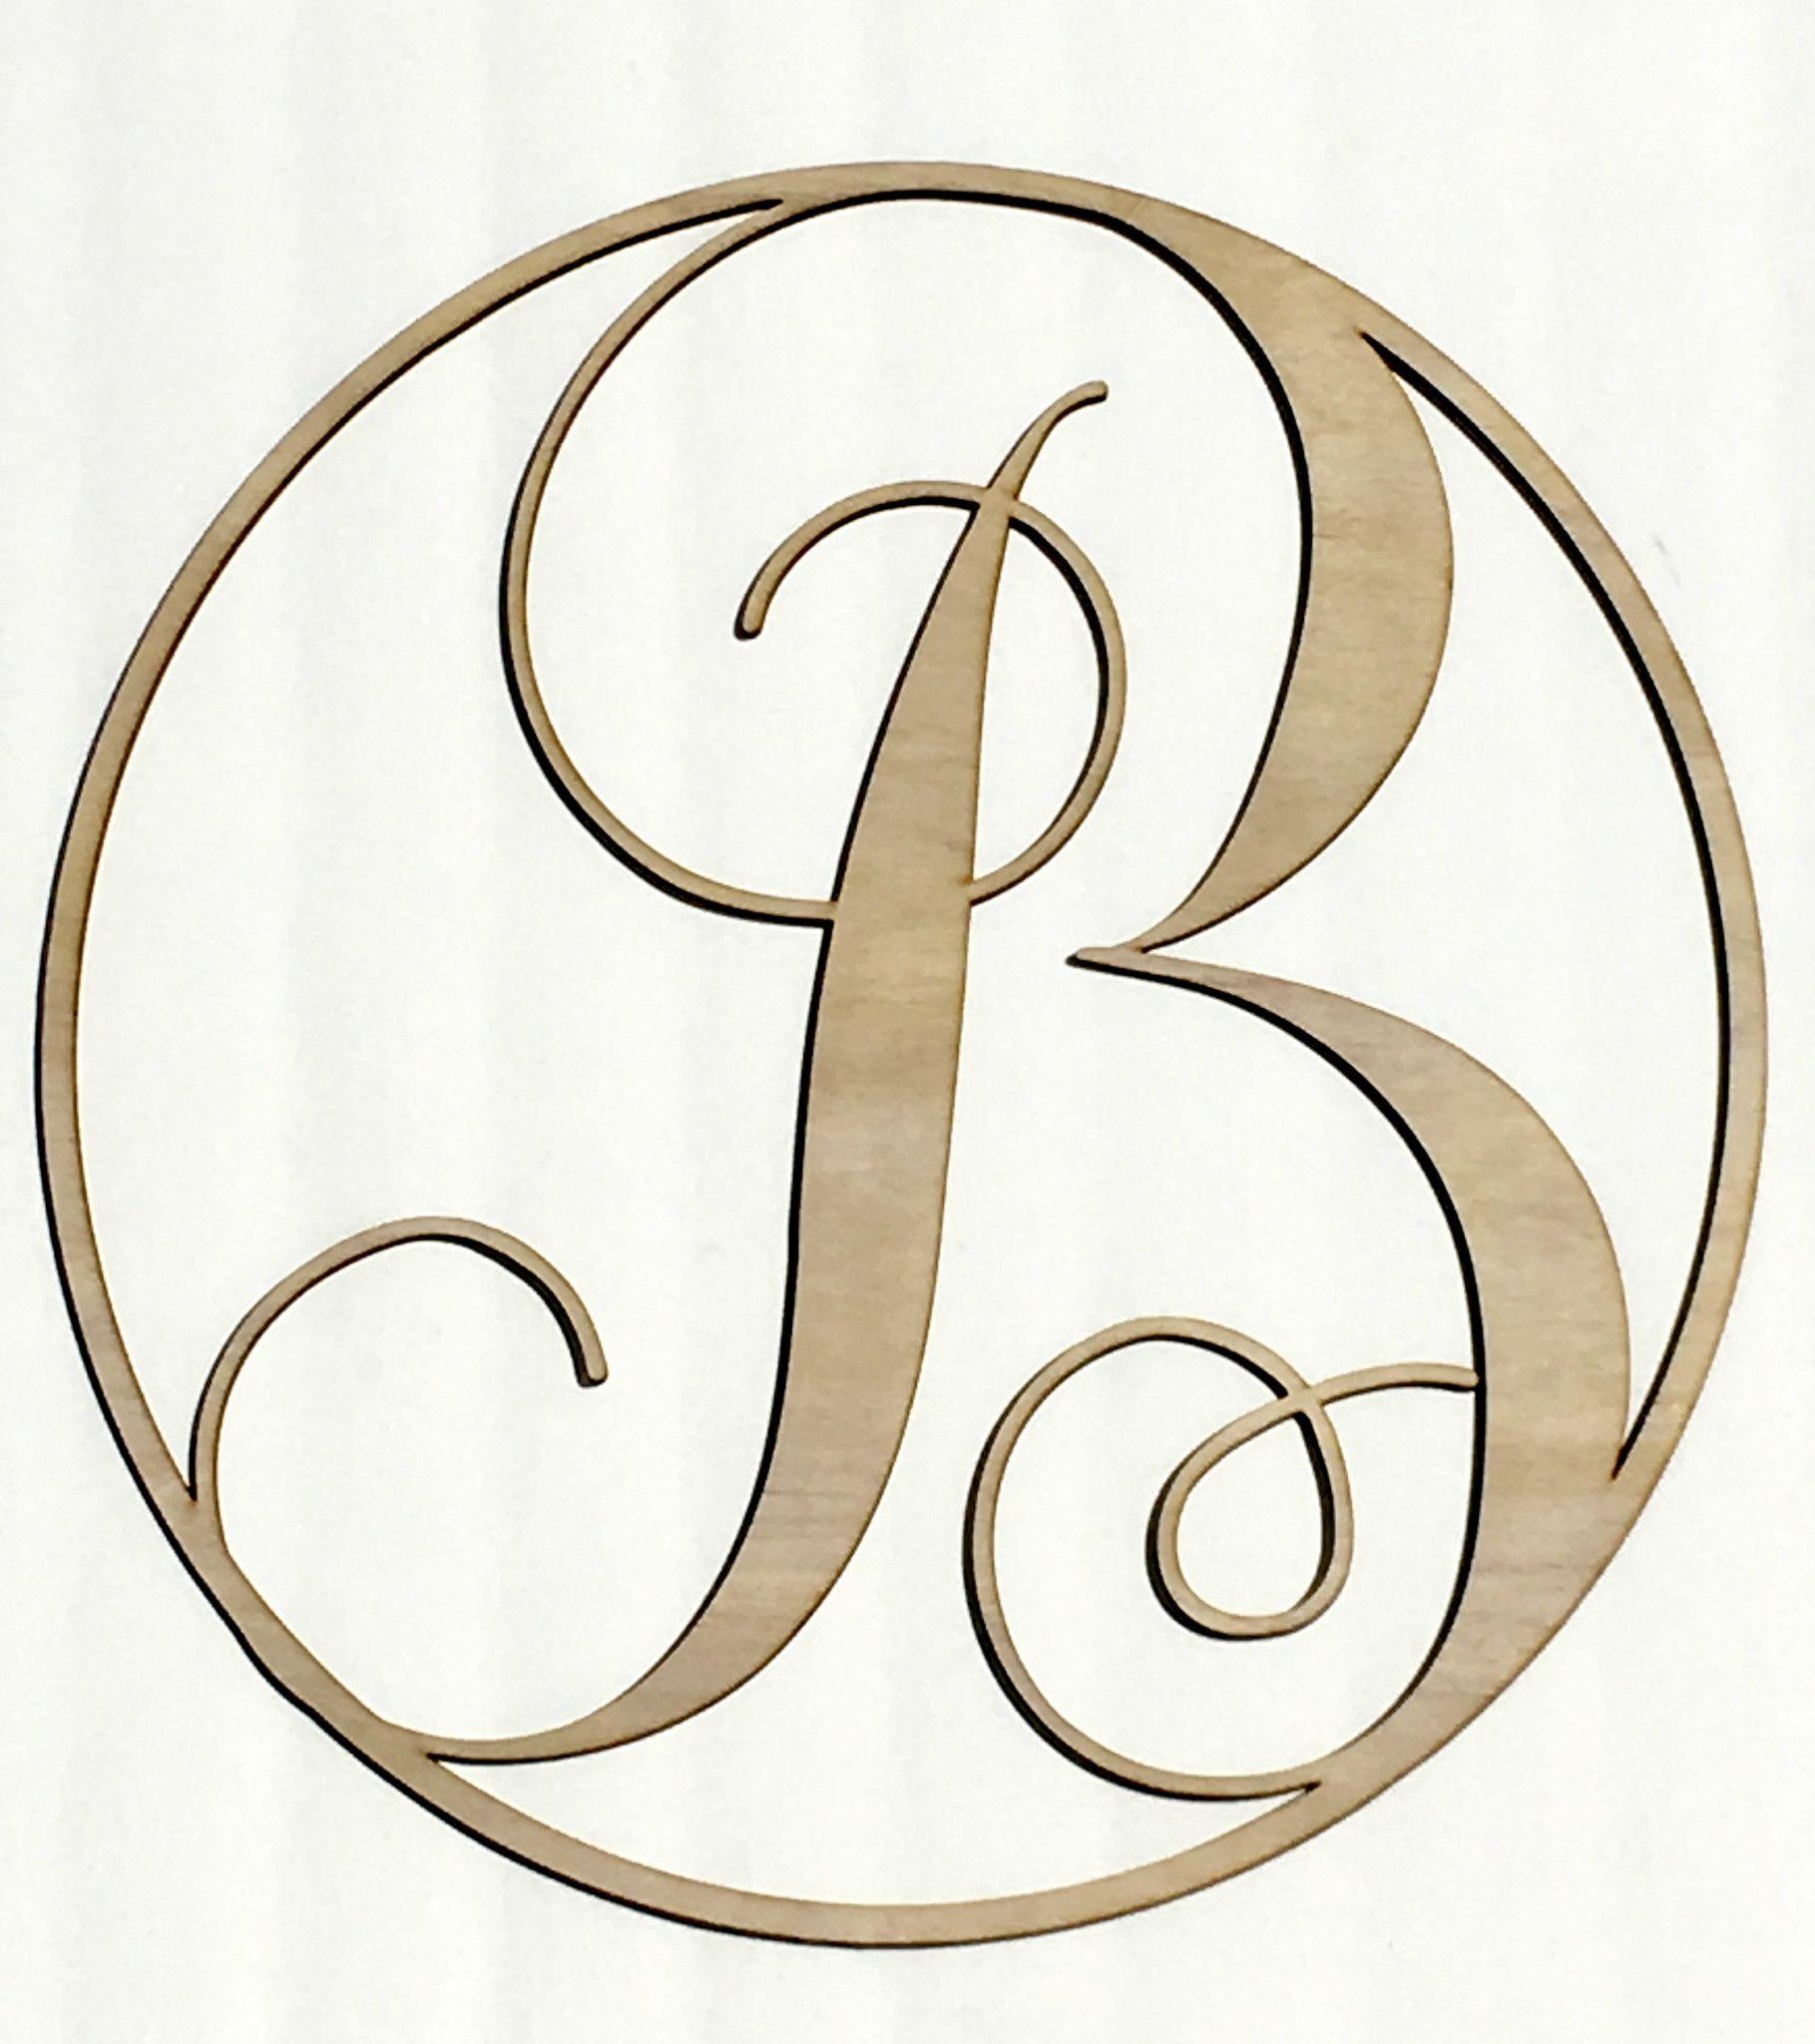 Wood Monogram Letters B Wood Monogram Letters Monogram Letters Wood Monogram